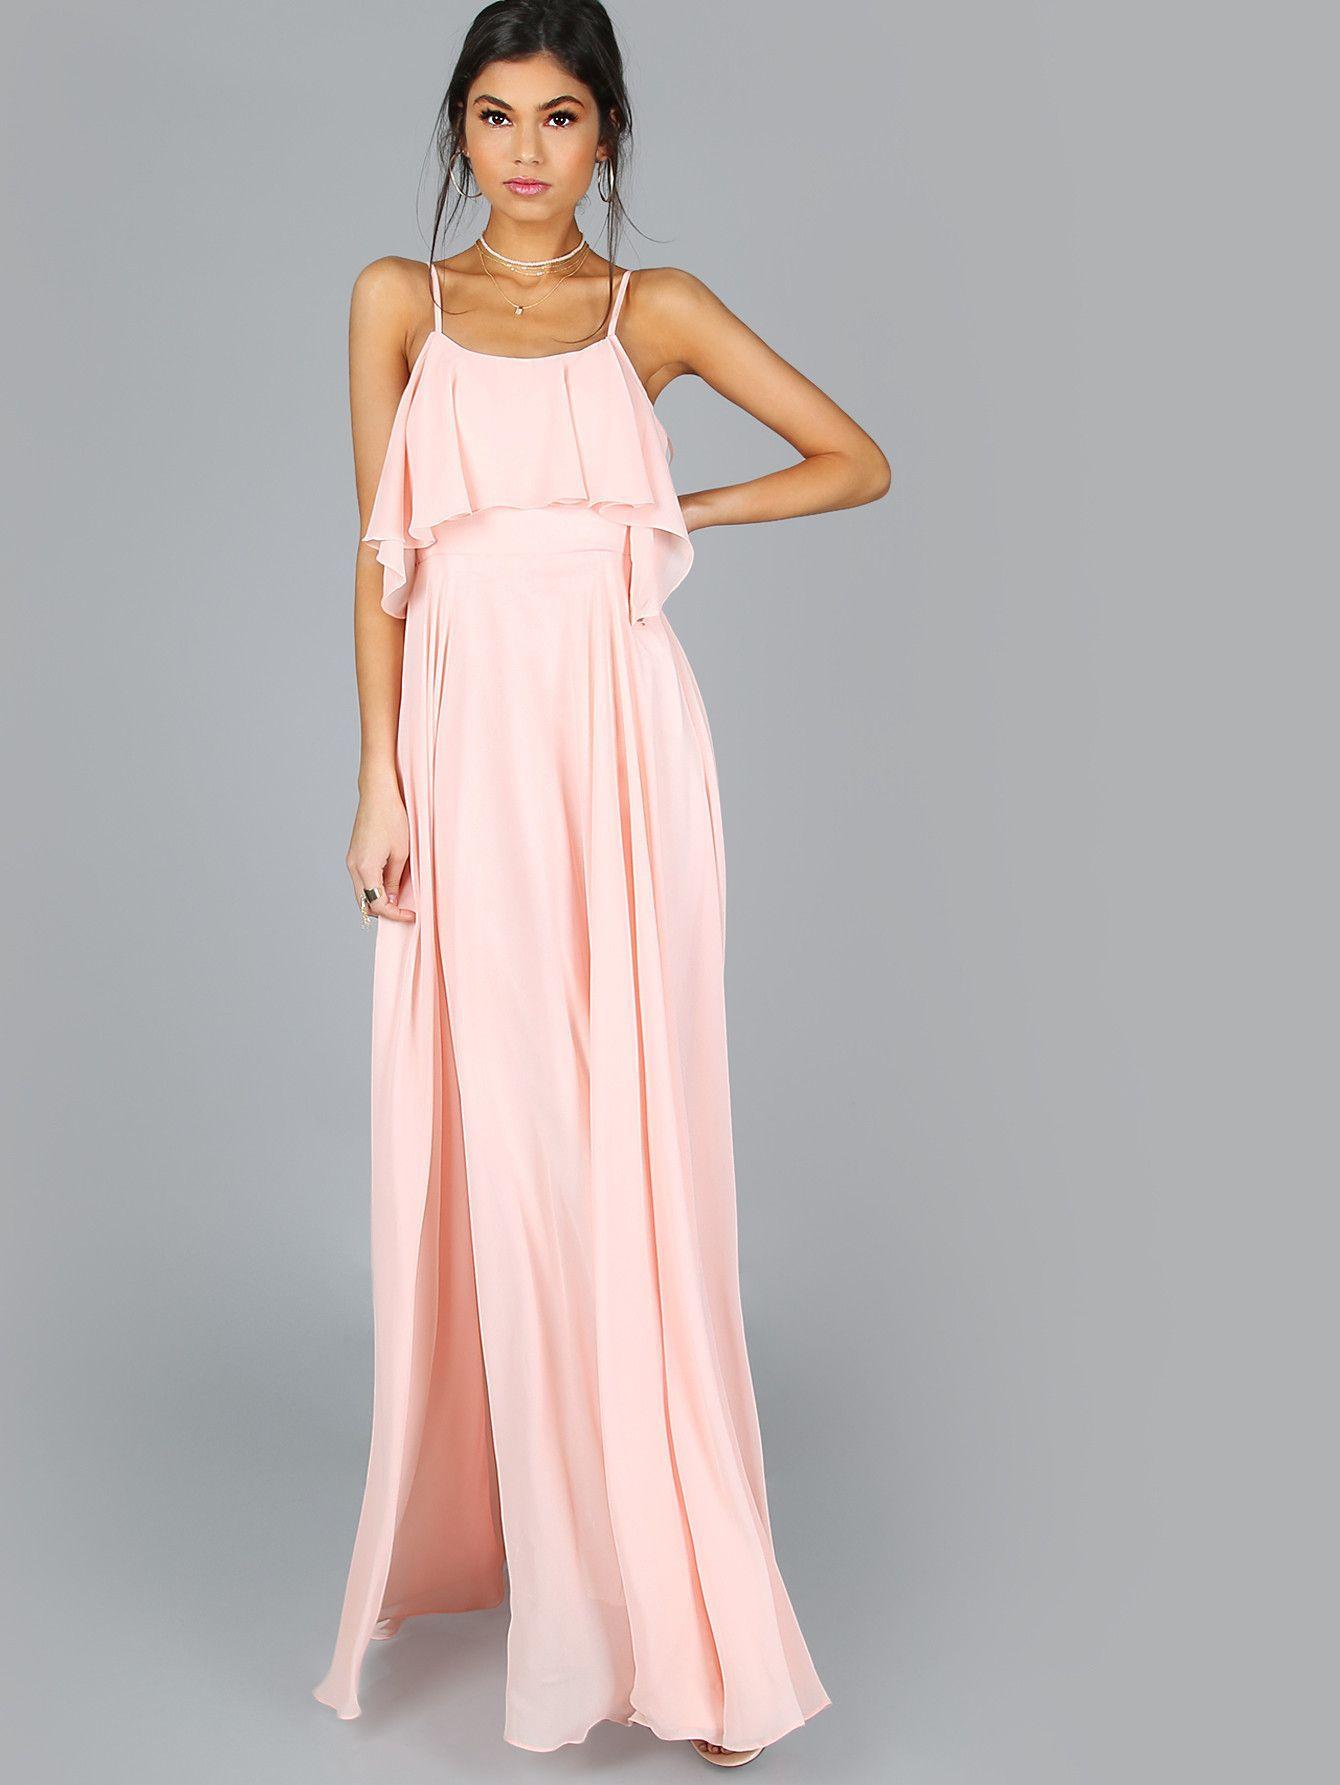 290f3f33da09 Pink Spaghetti Strap Frill Flow Maxi Dress in 2018